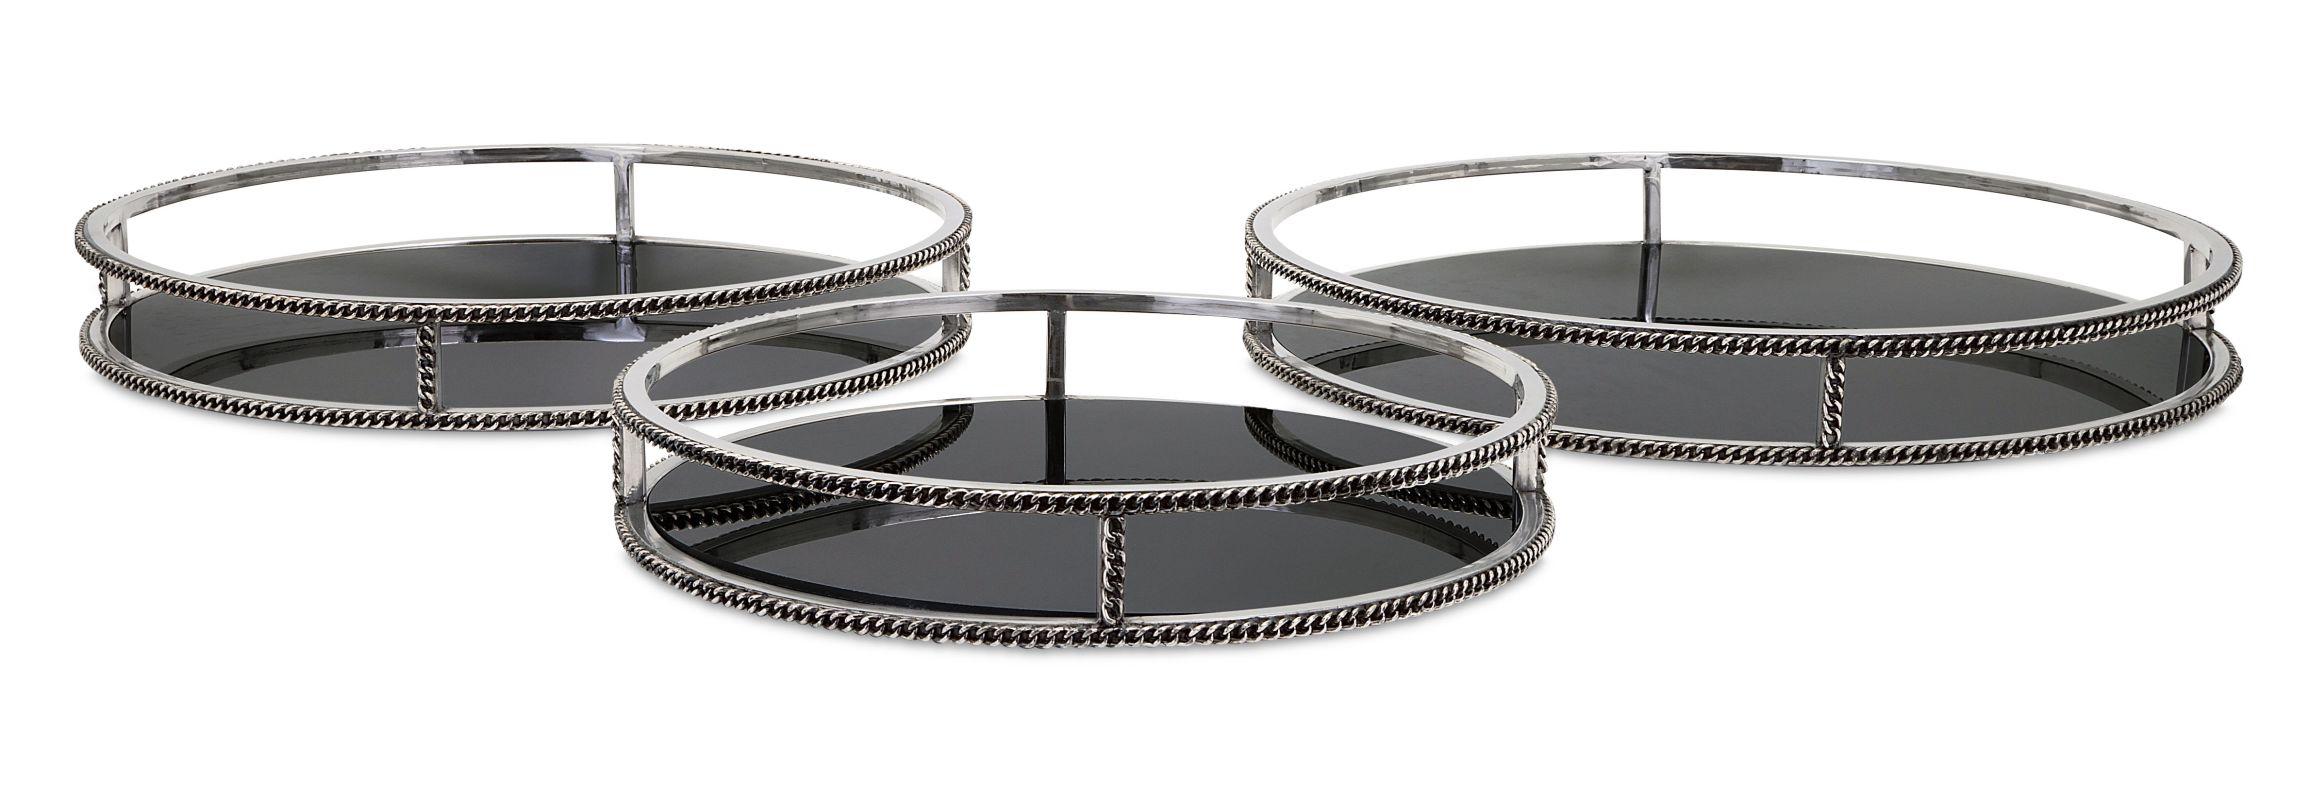 IMAX Home 86052-3 Nikki Chu Chain Trays - Set of 3 Home Decor